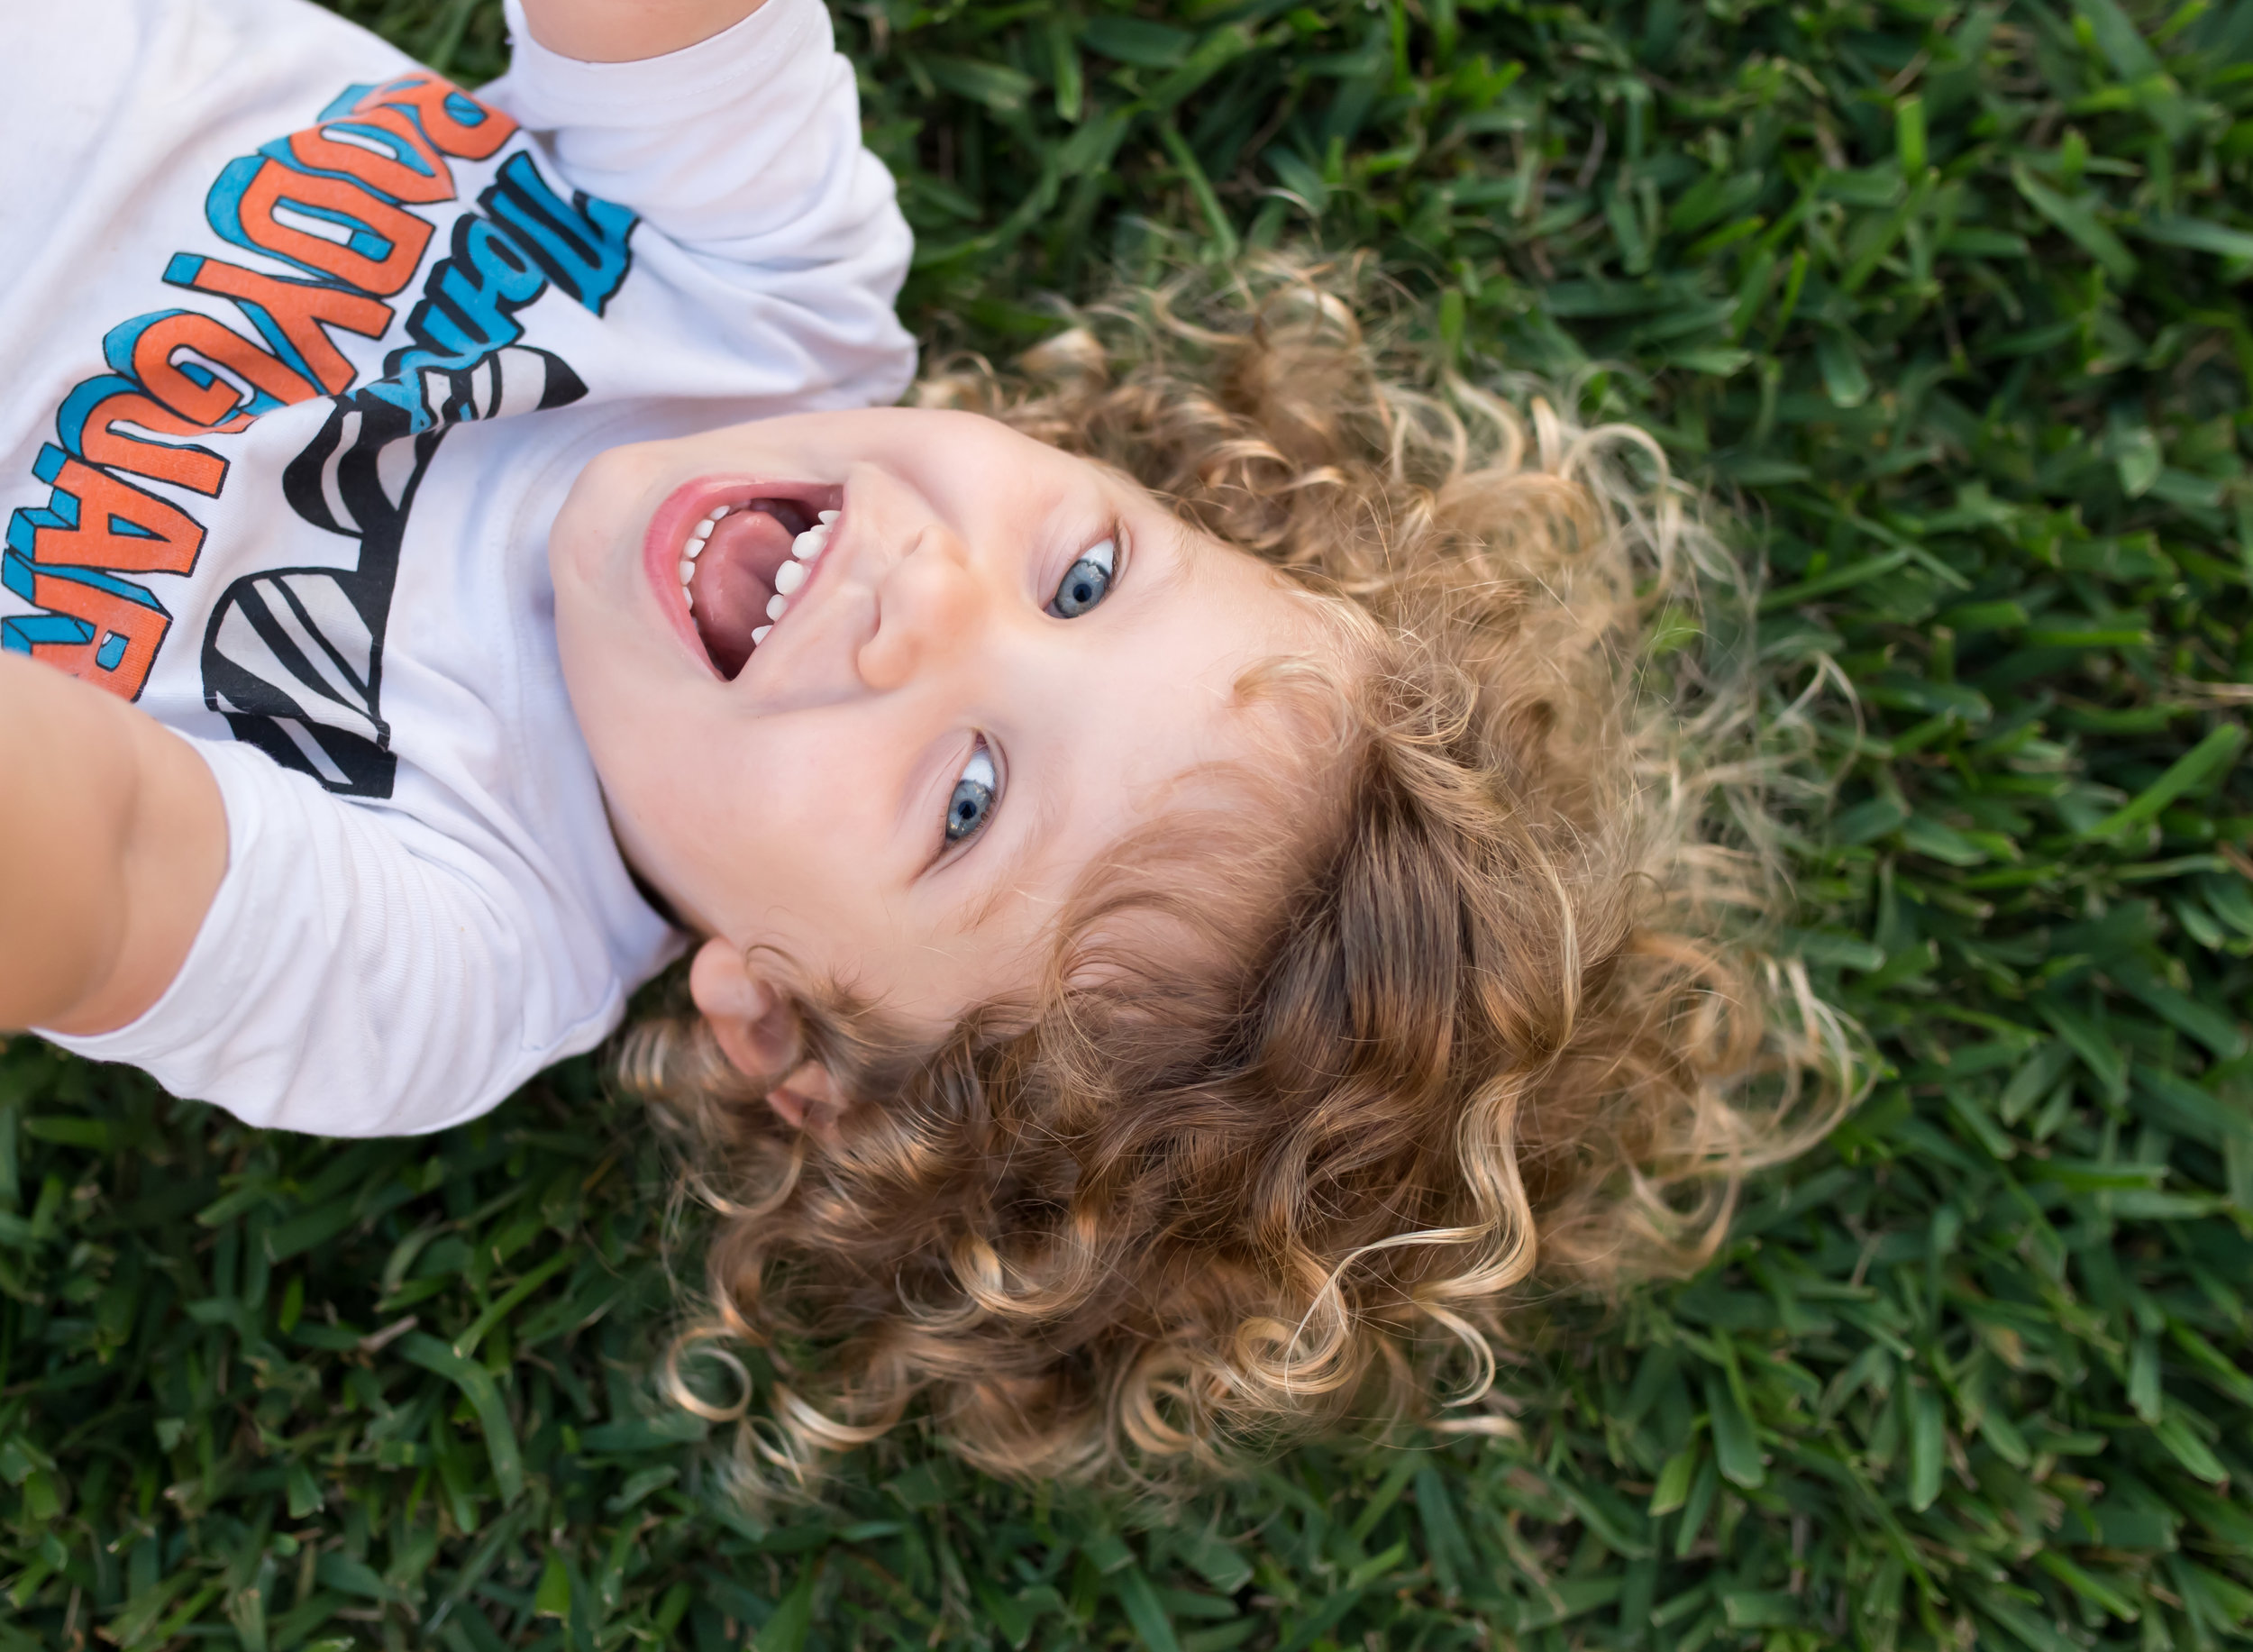 boca-raton-child-photographer-parkland-family-photographer-coral-springs-wellington-lake-worth-boynton-lantana-alissa-delucca-photography-blonde-boy-with-curls.jpg